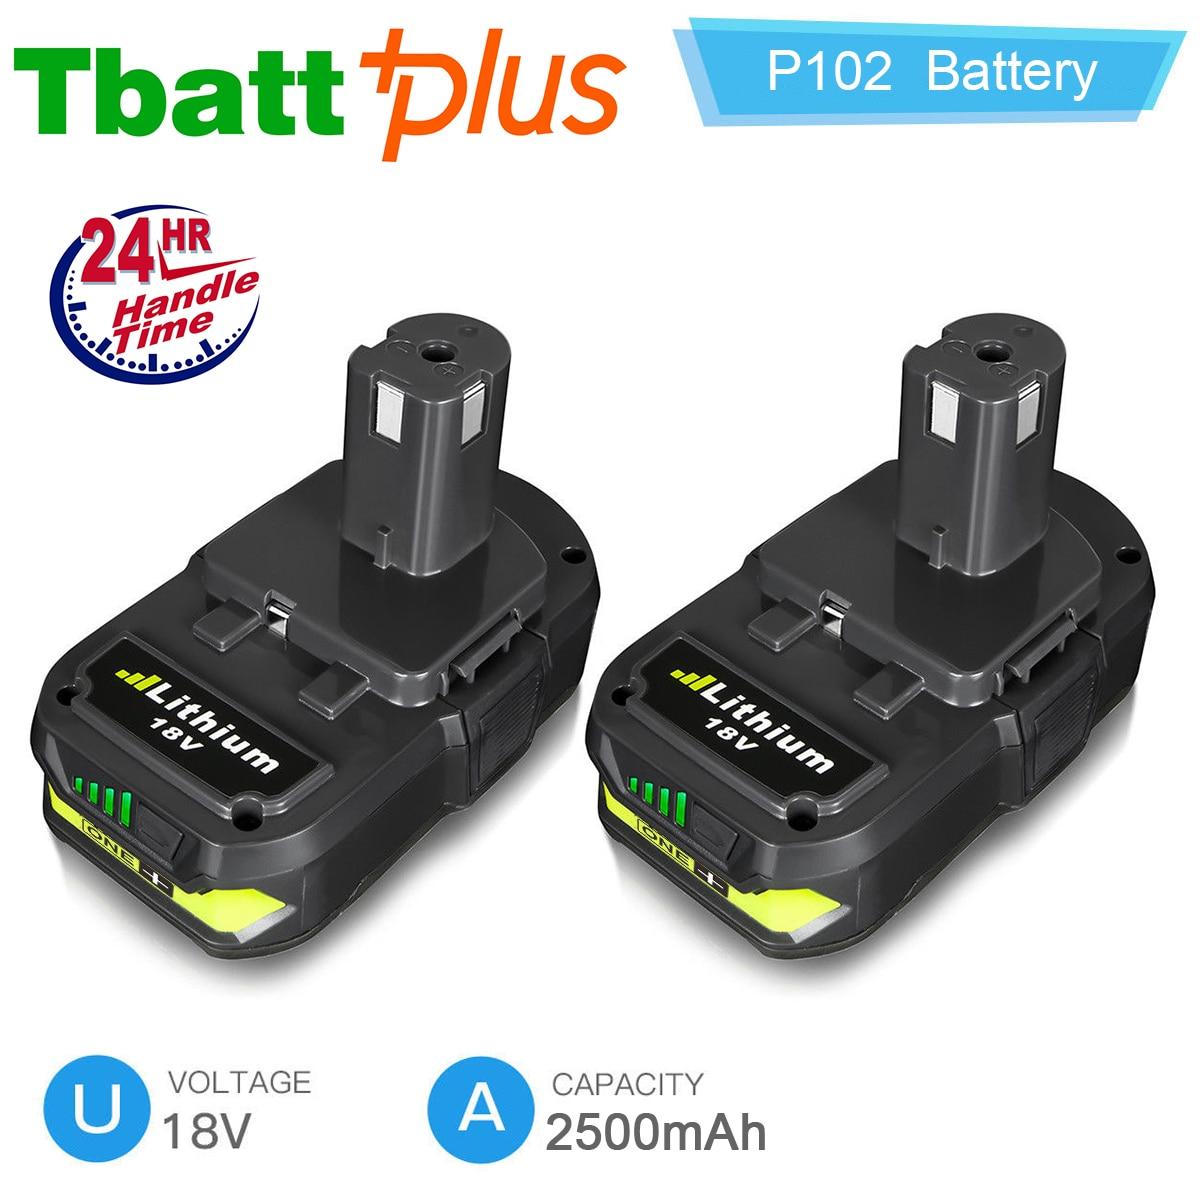 For 18V Lithium Battery Ryobi ONE Plus P102 P103 P104 P108 P105 P107 2 5Ah